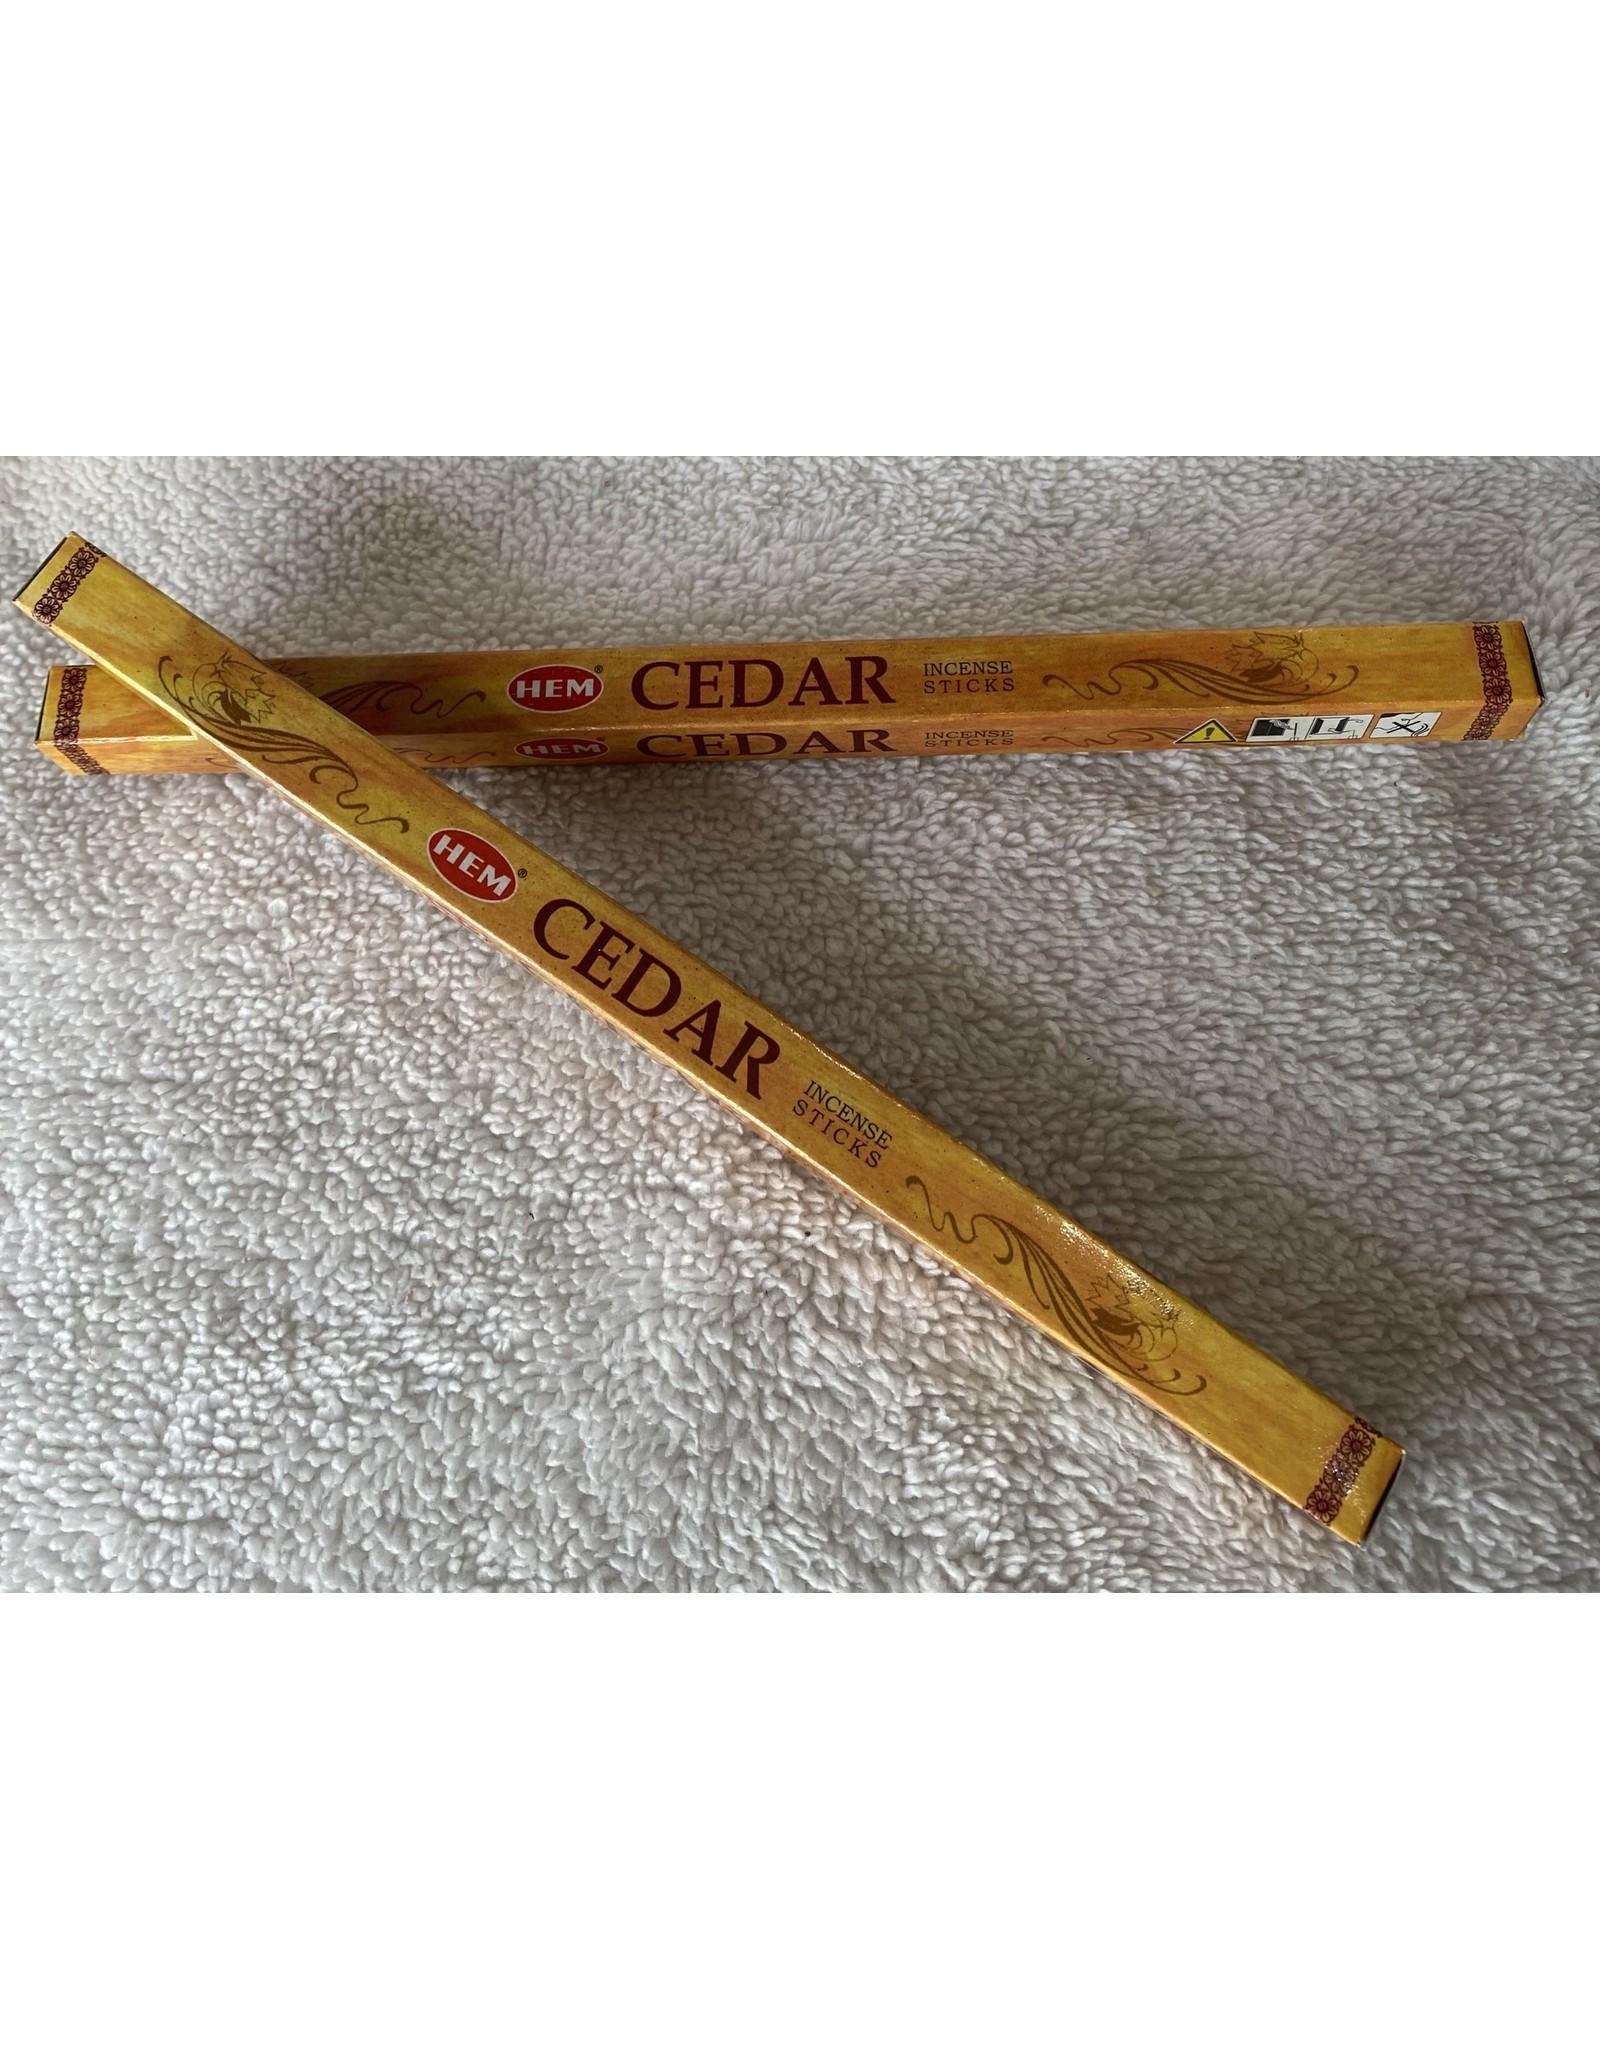 Hem Cedar Incense